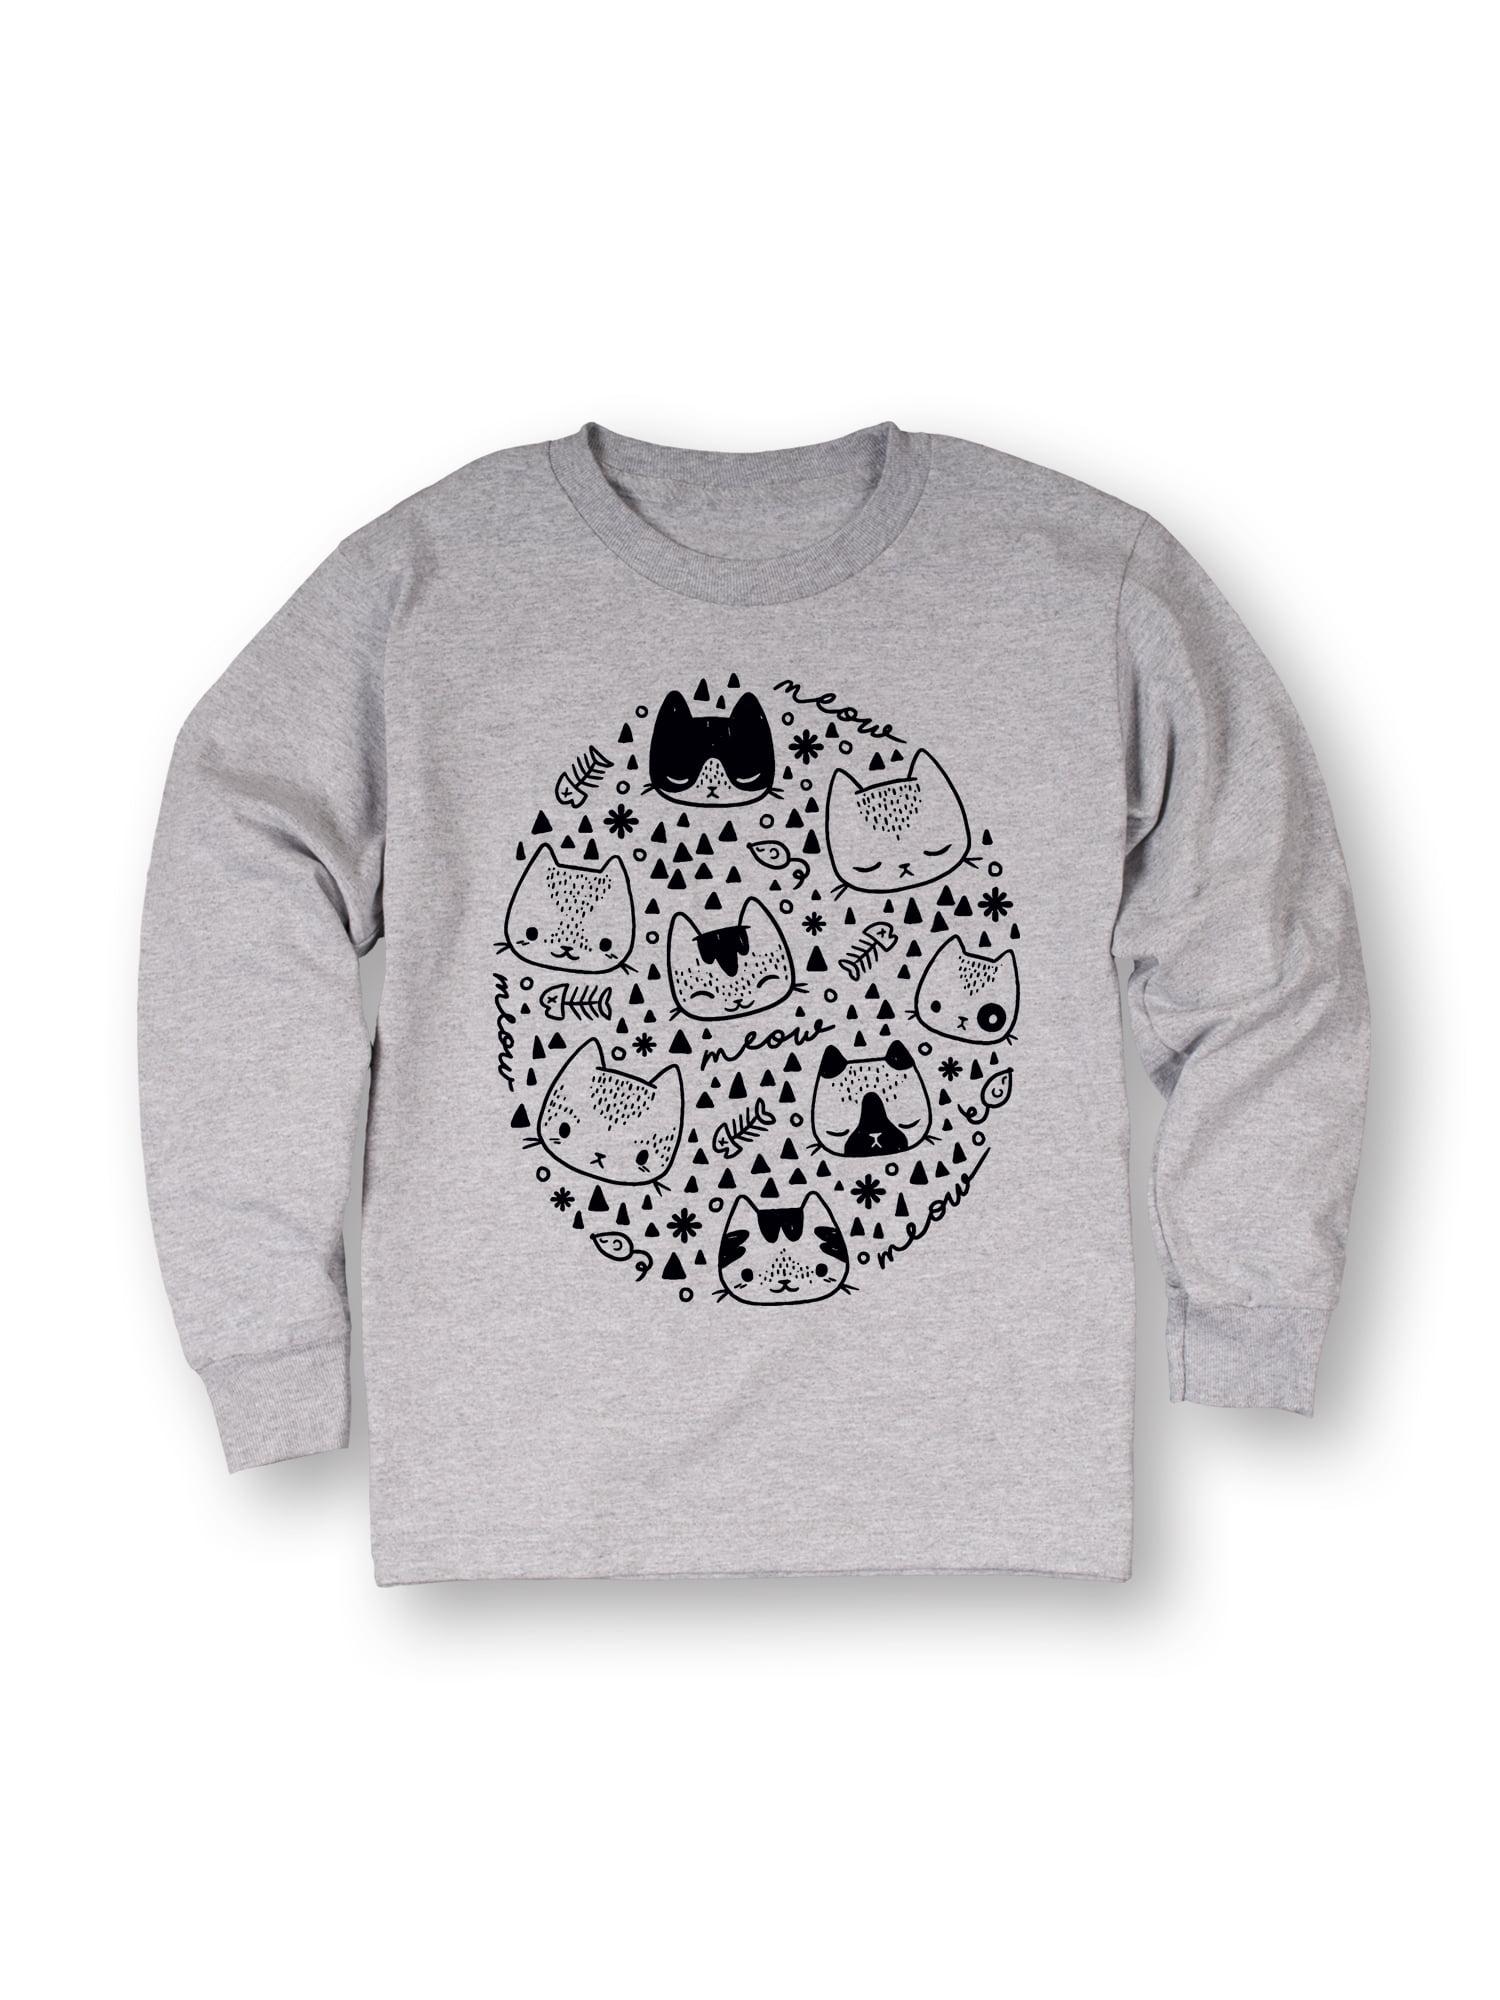 Cat Symbols Black Sketch-TODDLER LONG SLEEVE TEE